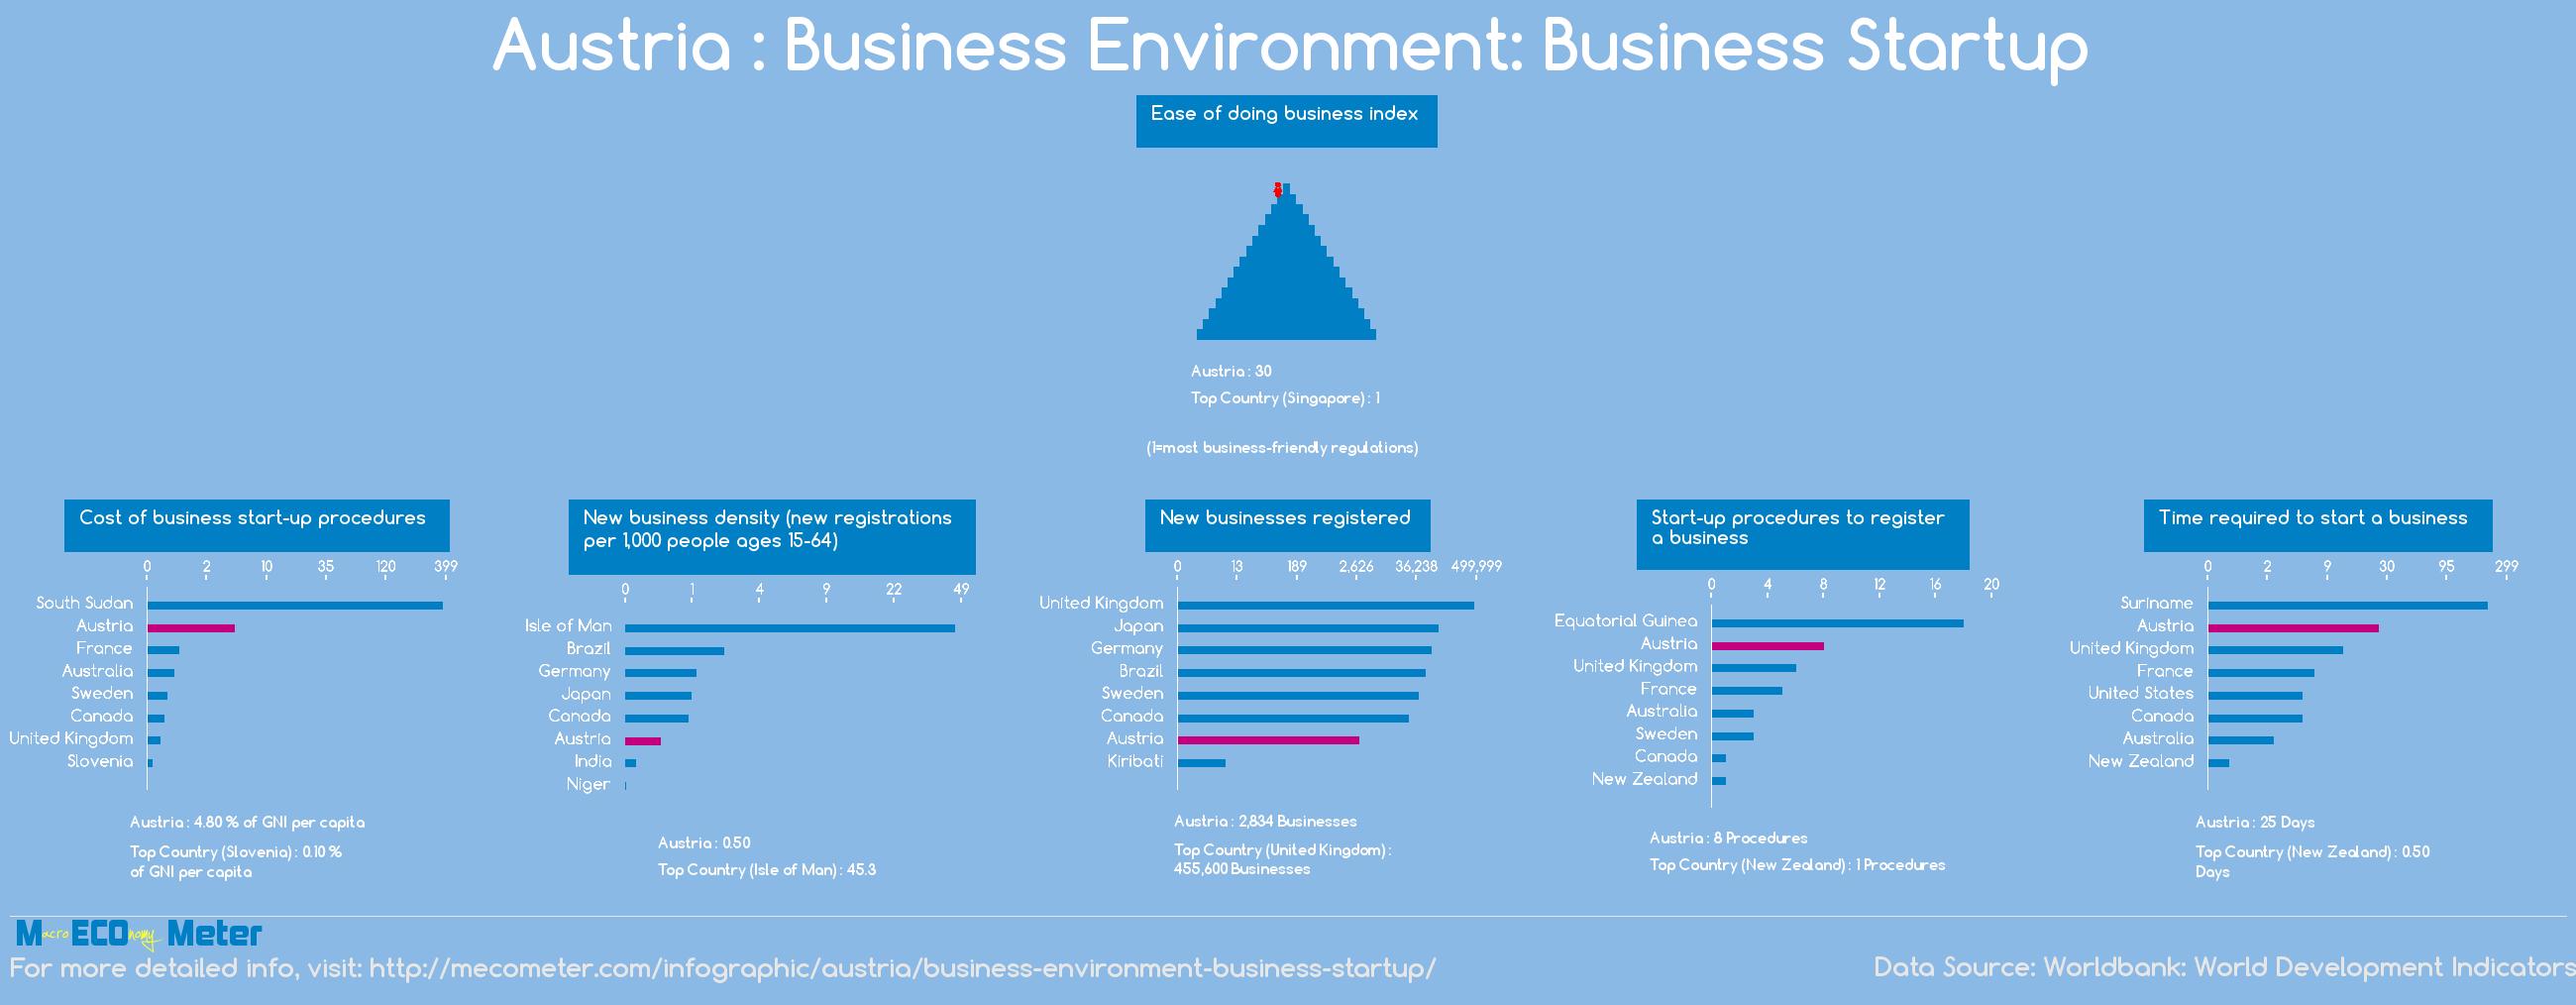 Austria : Business Environment: Business Startup